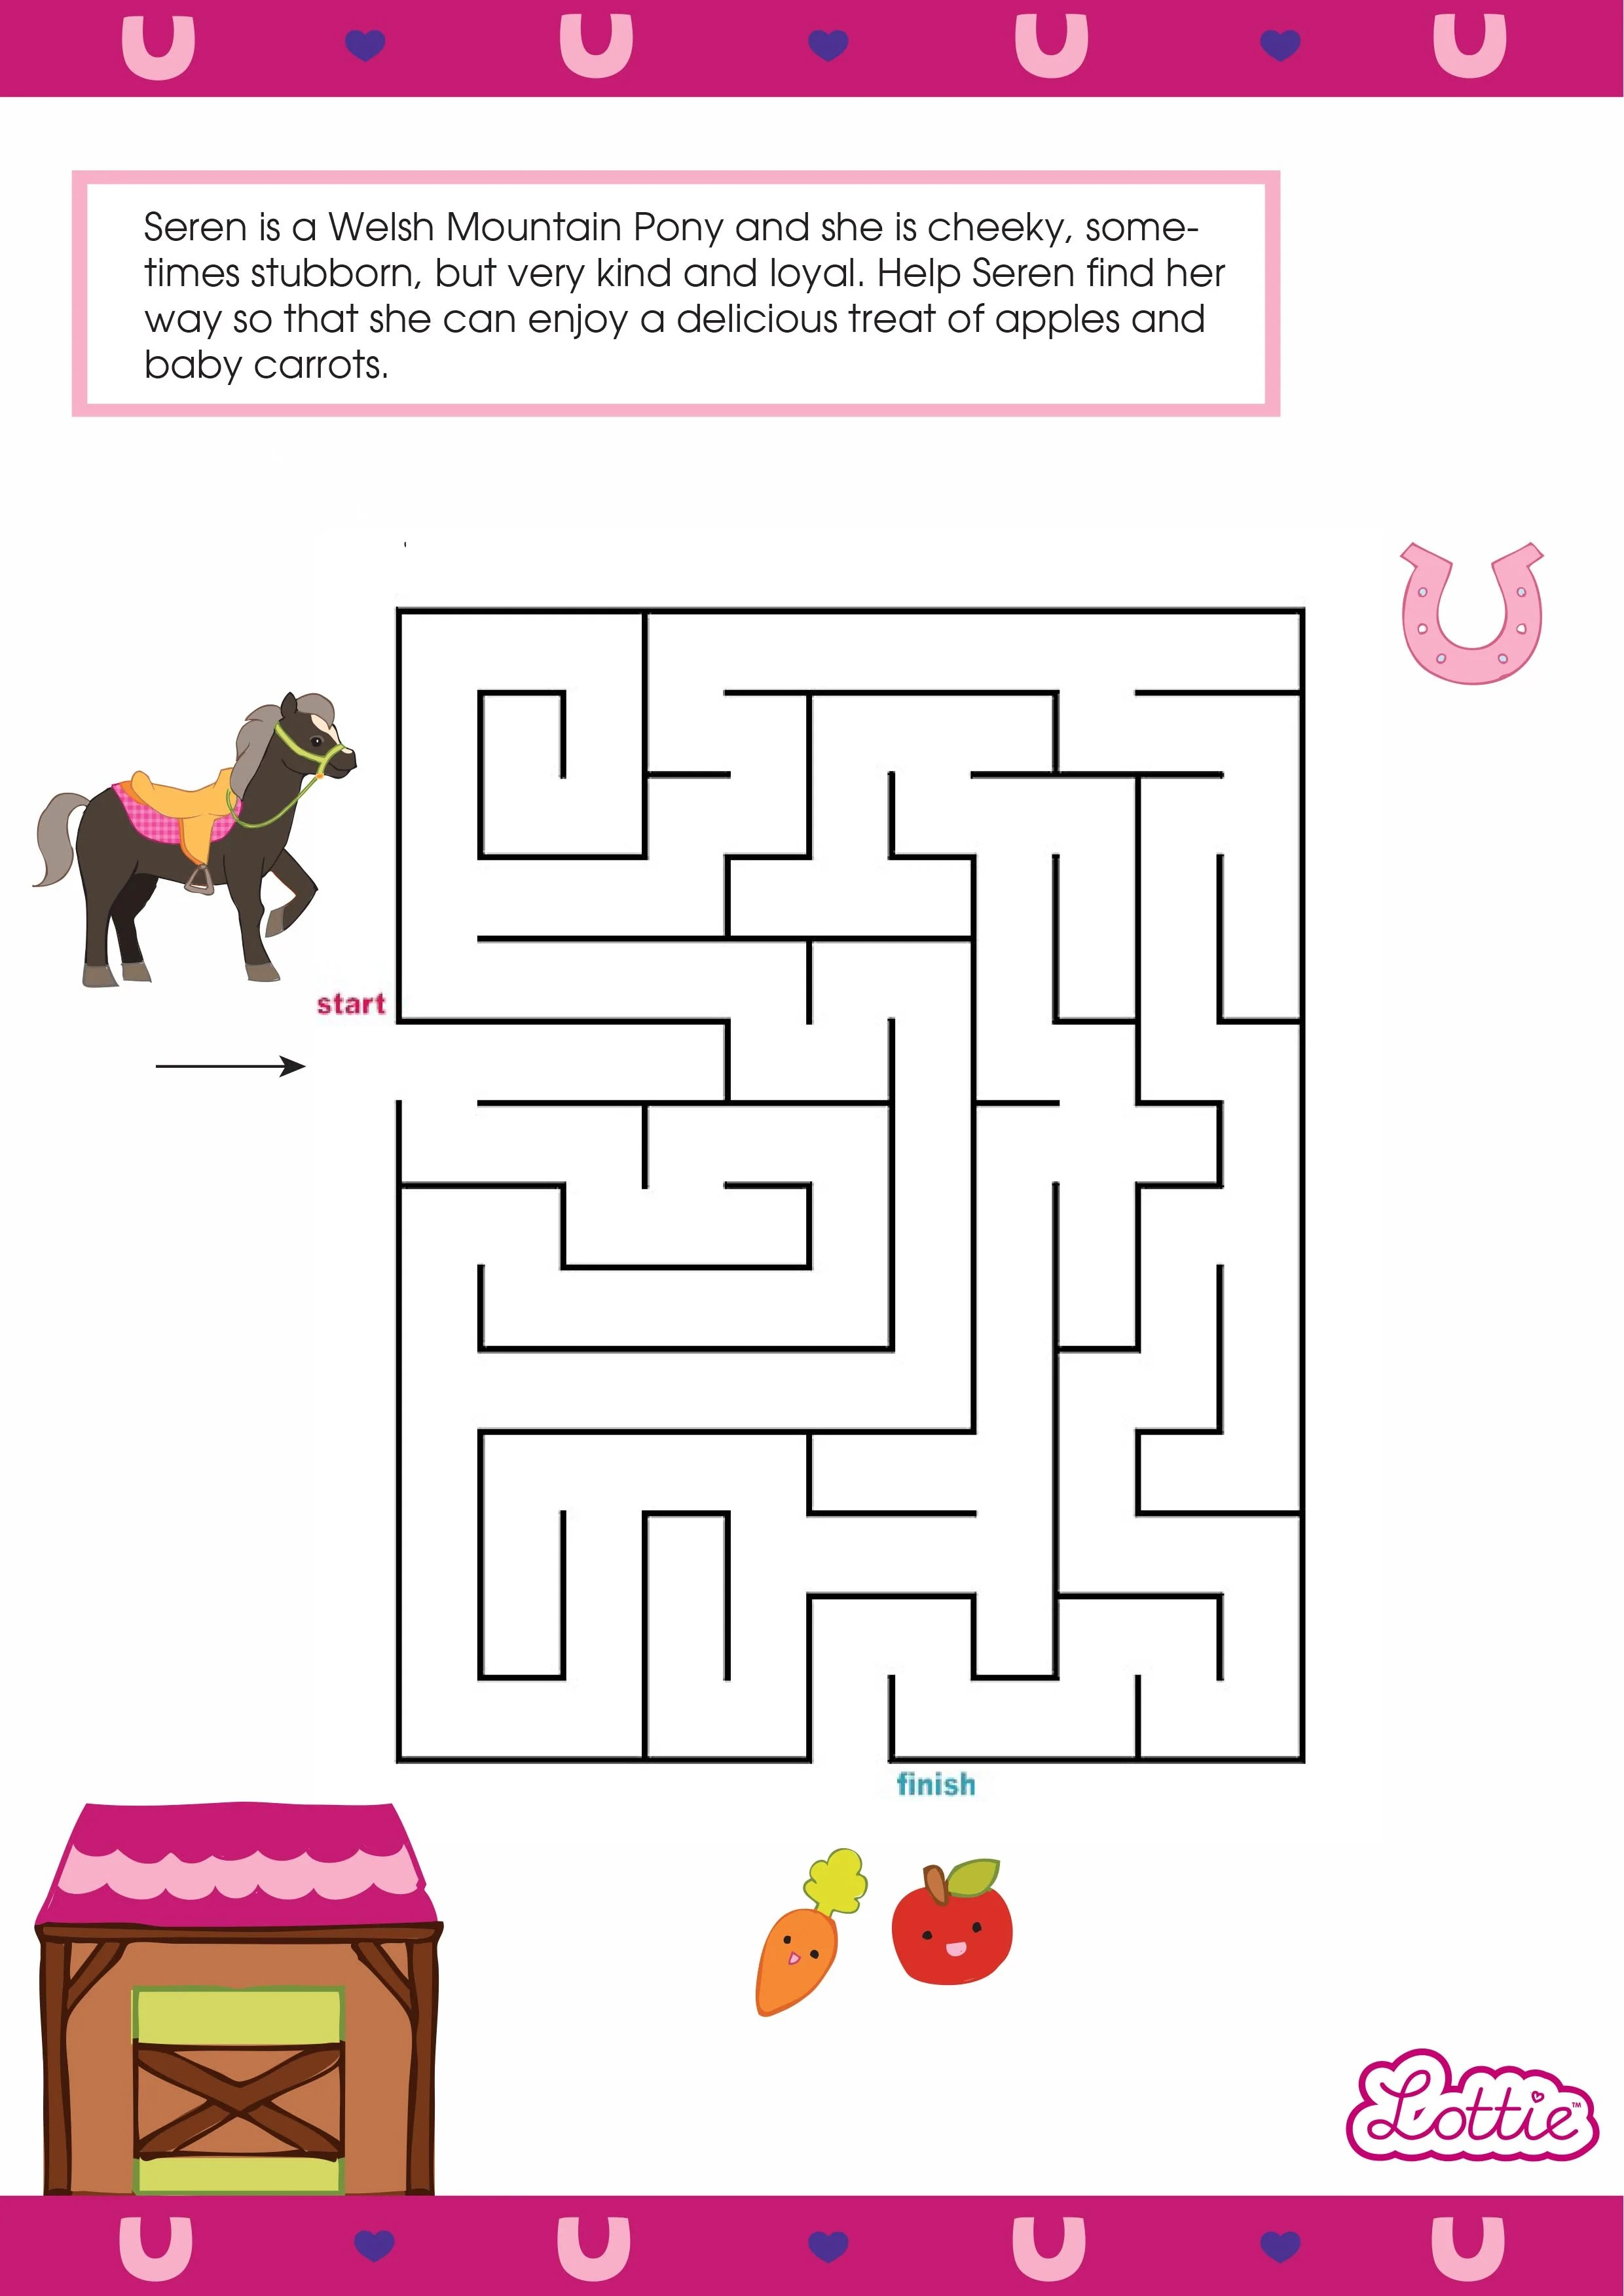 Seren The Welsh Mountain Pony Lottie Printable Maze